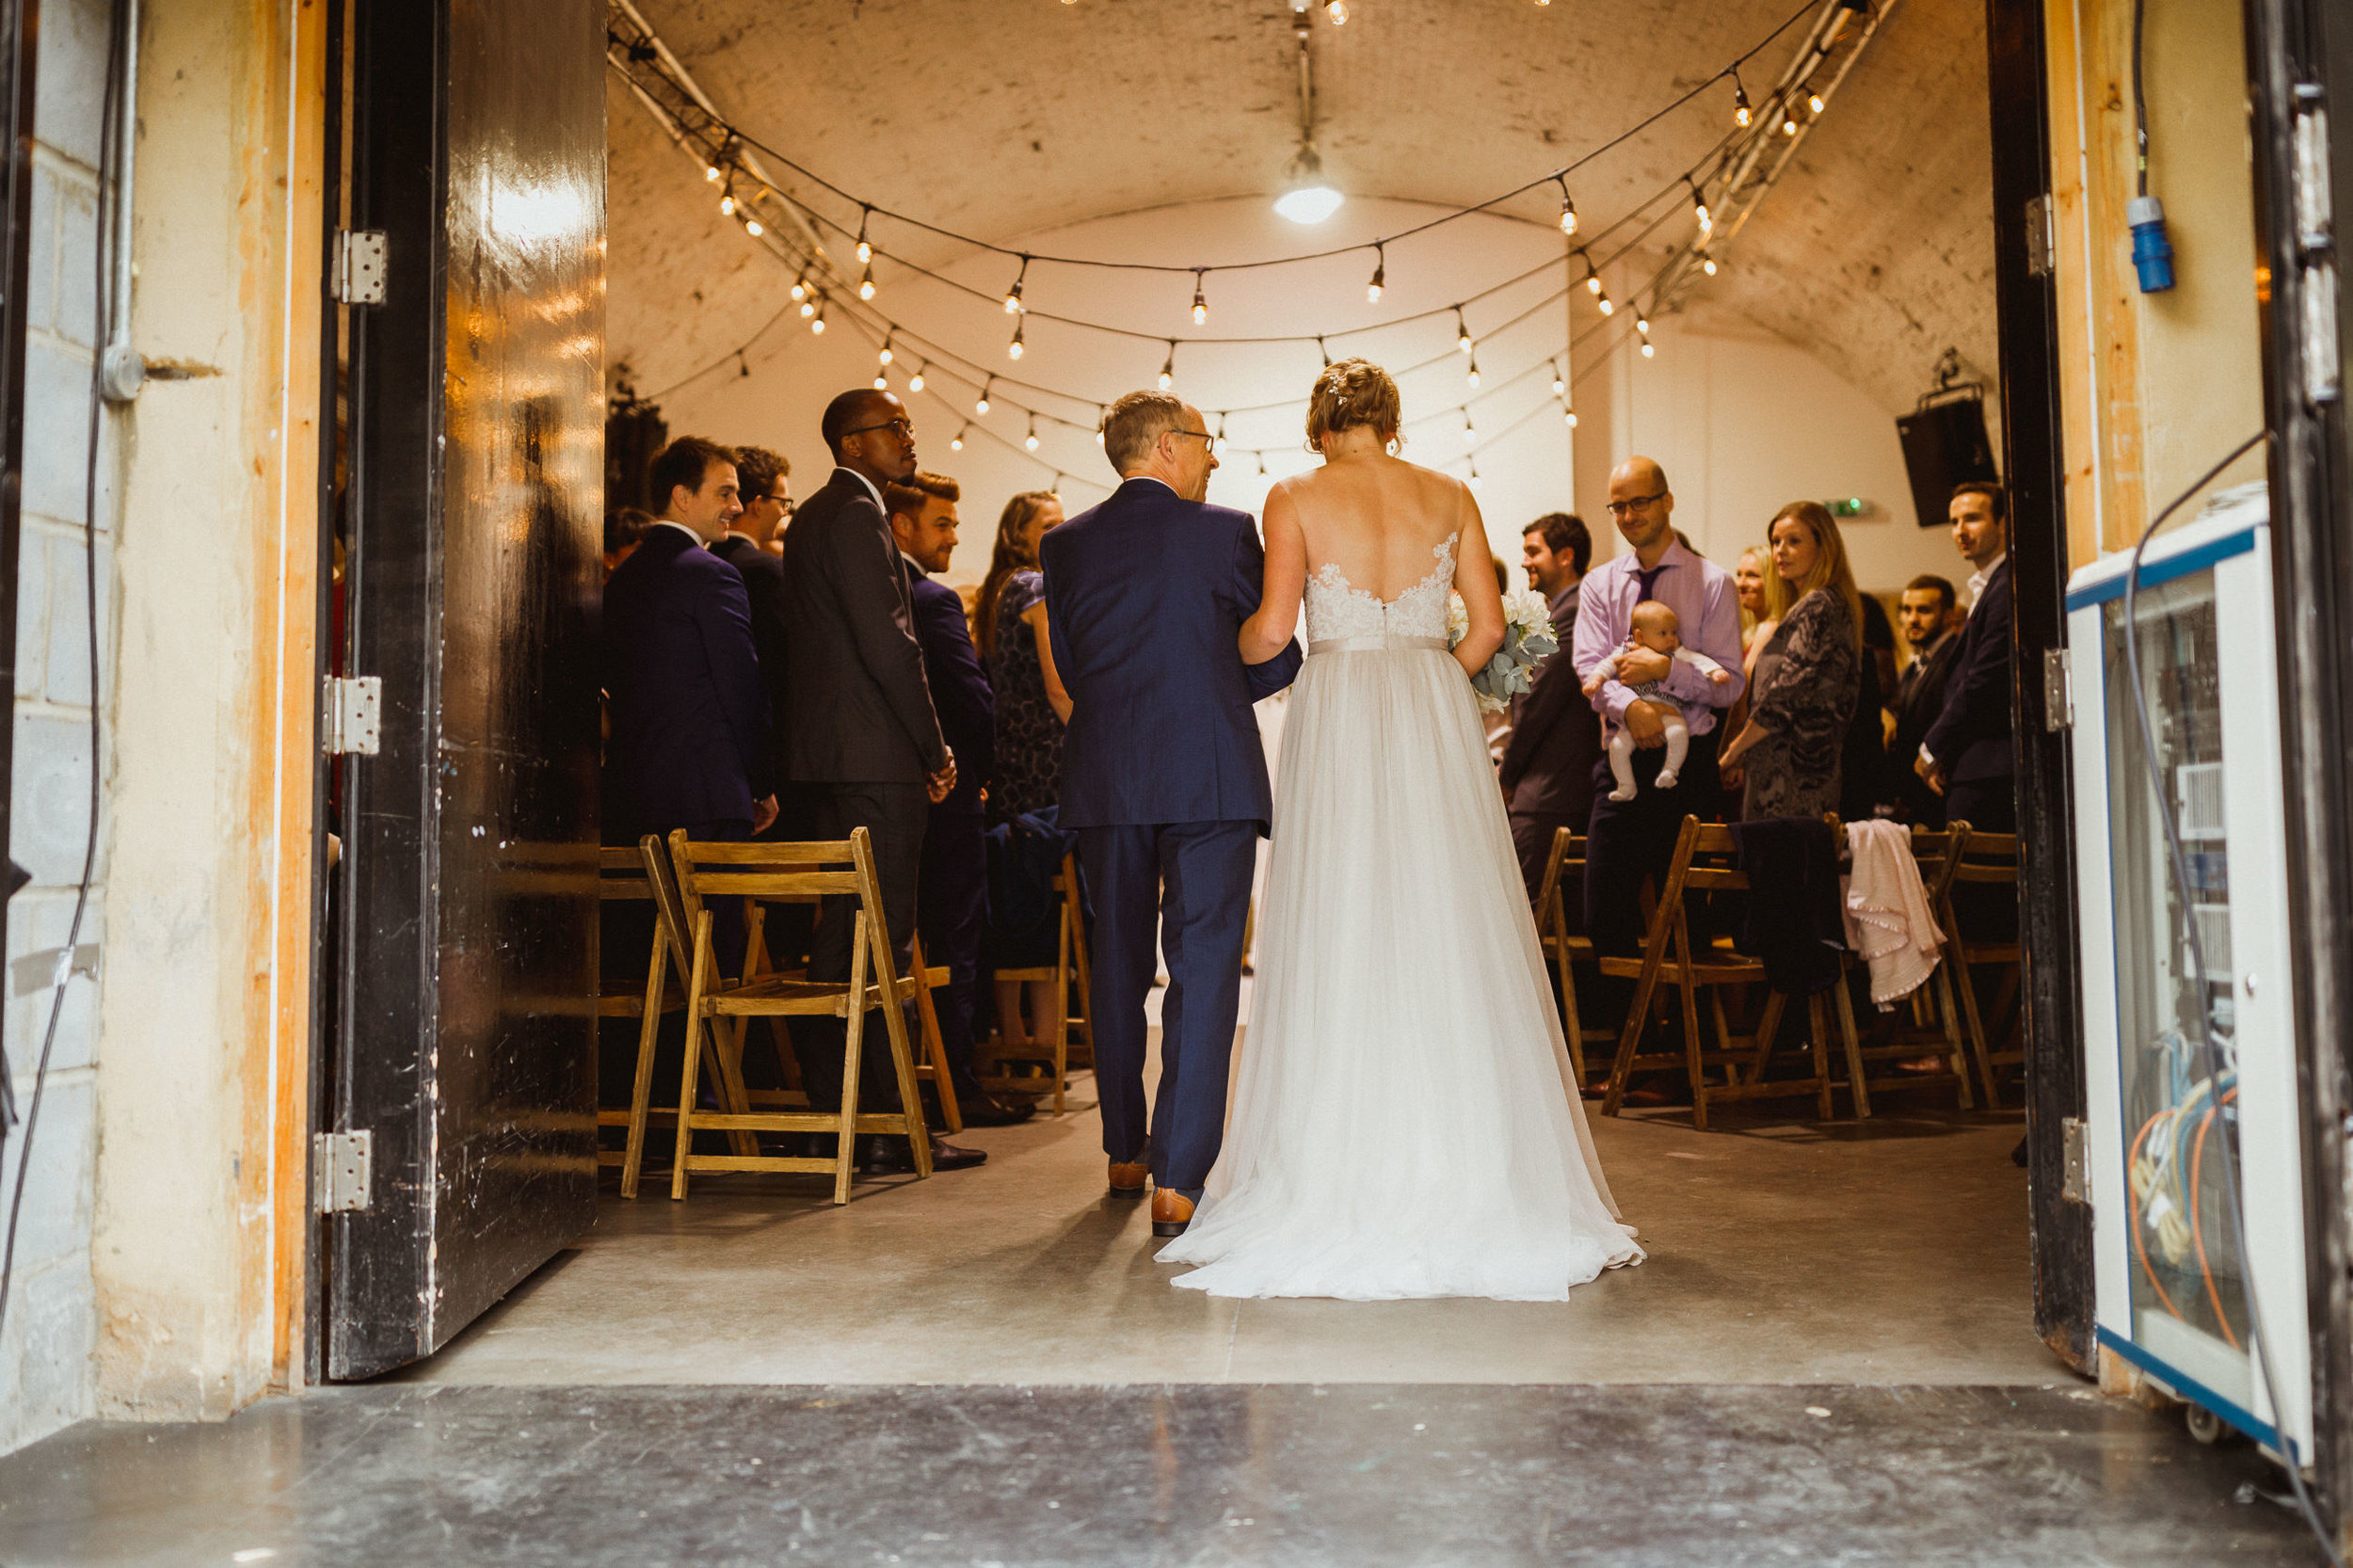 London-wedding-photographer-gione-da-silva-alex_paul-77.jpg